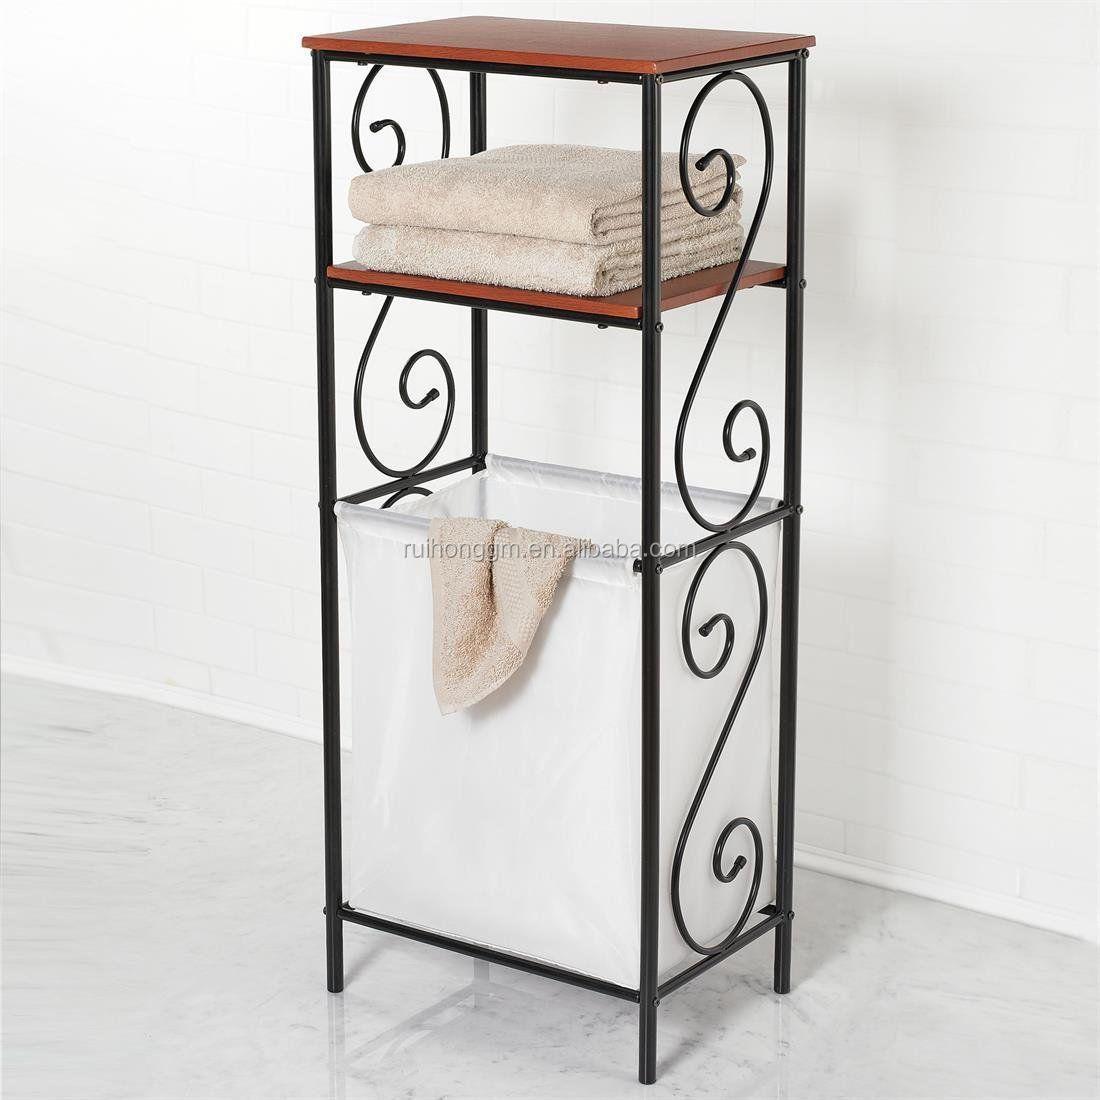 tiers metal bathroom scroll storage organizer laundry sorter, Home decor